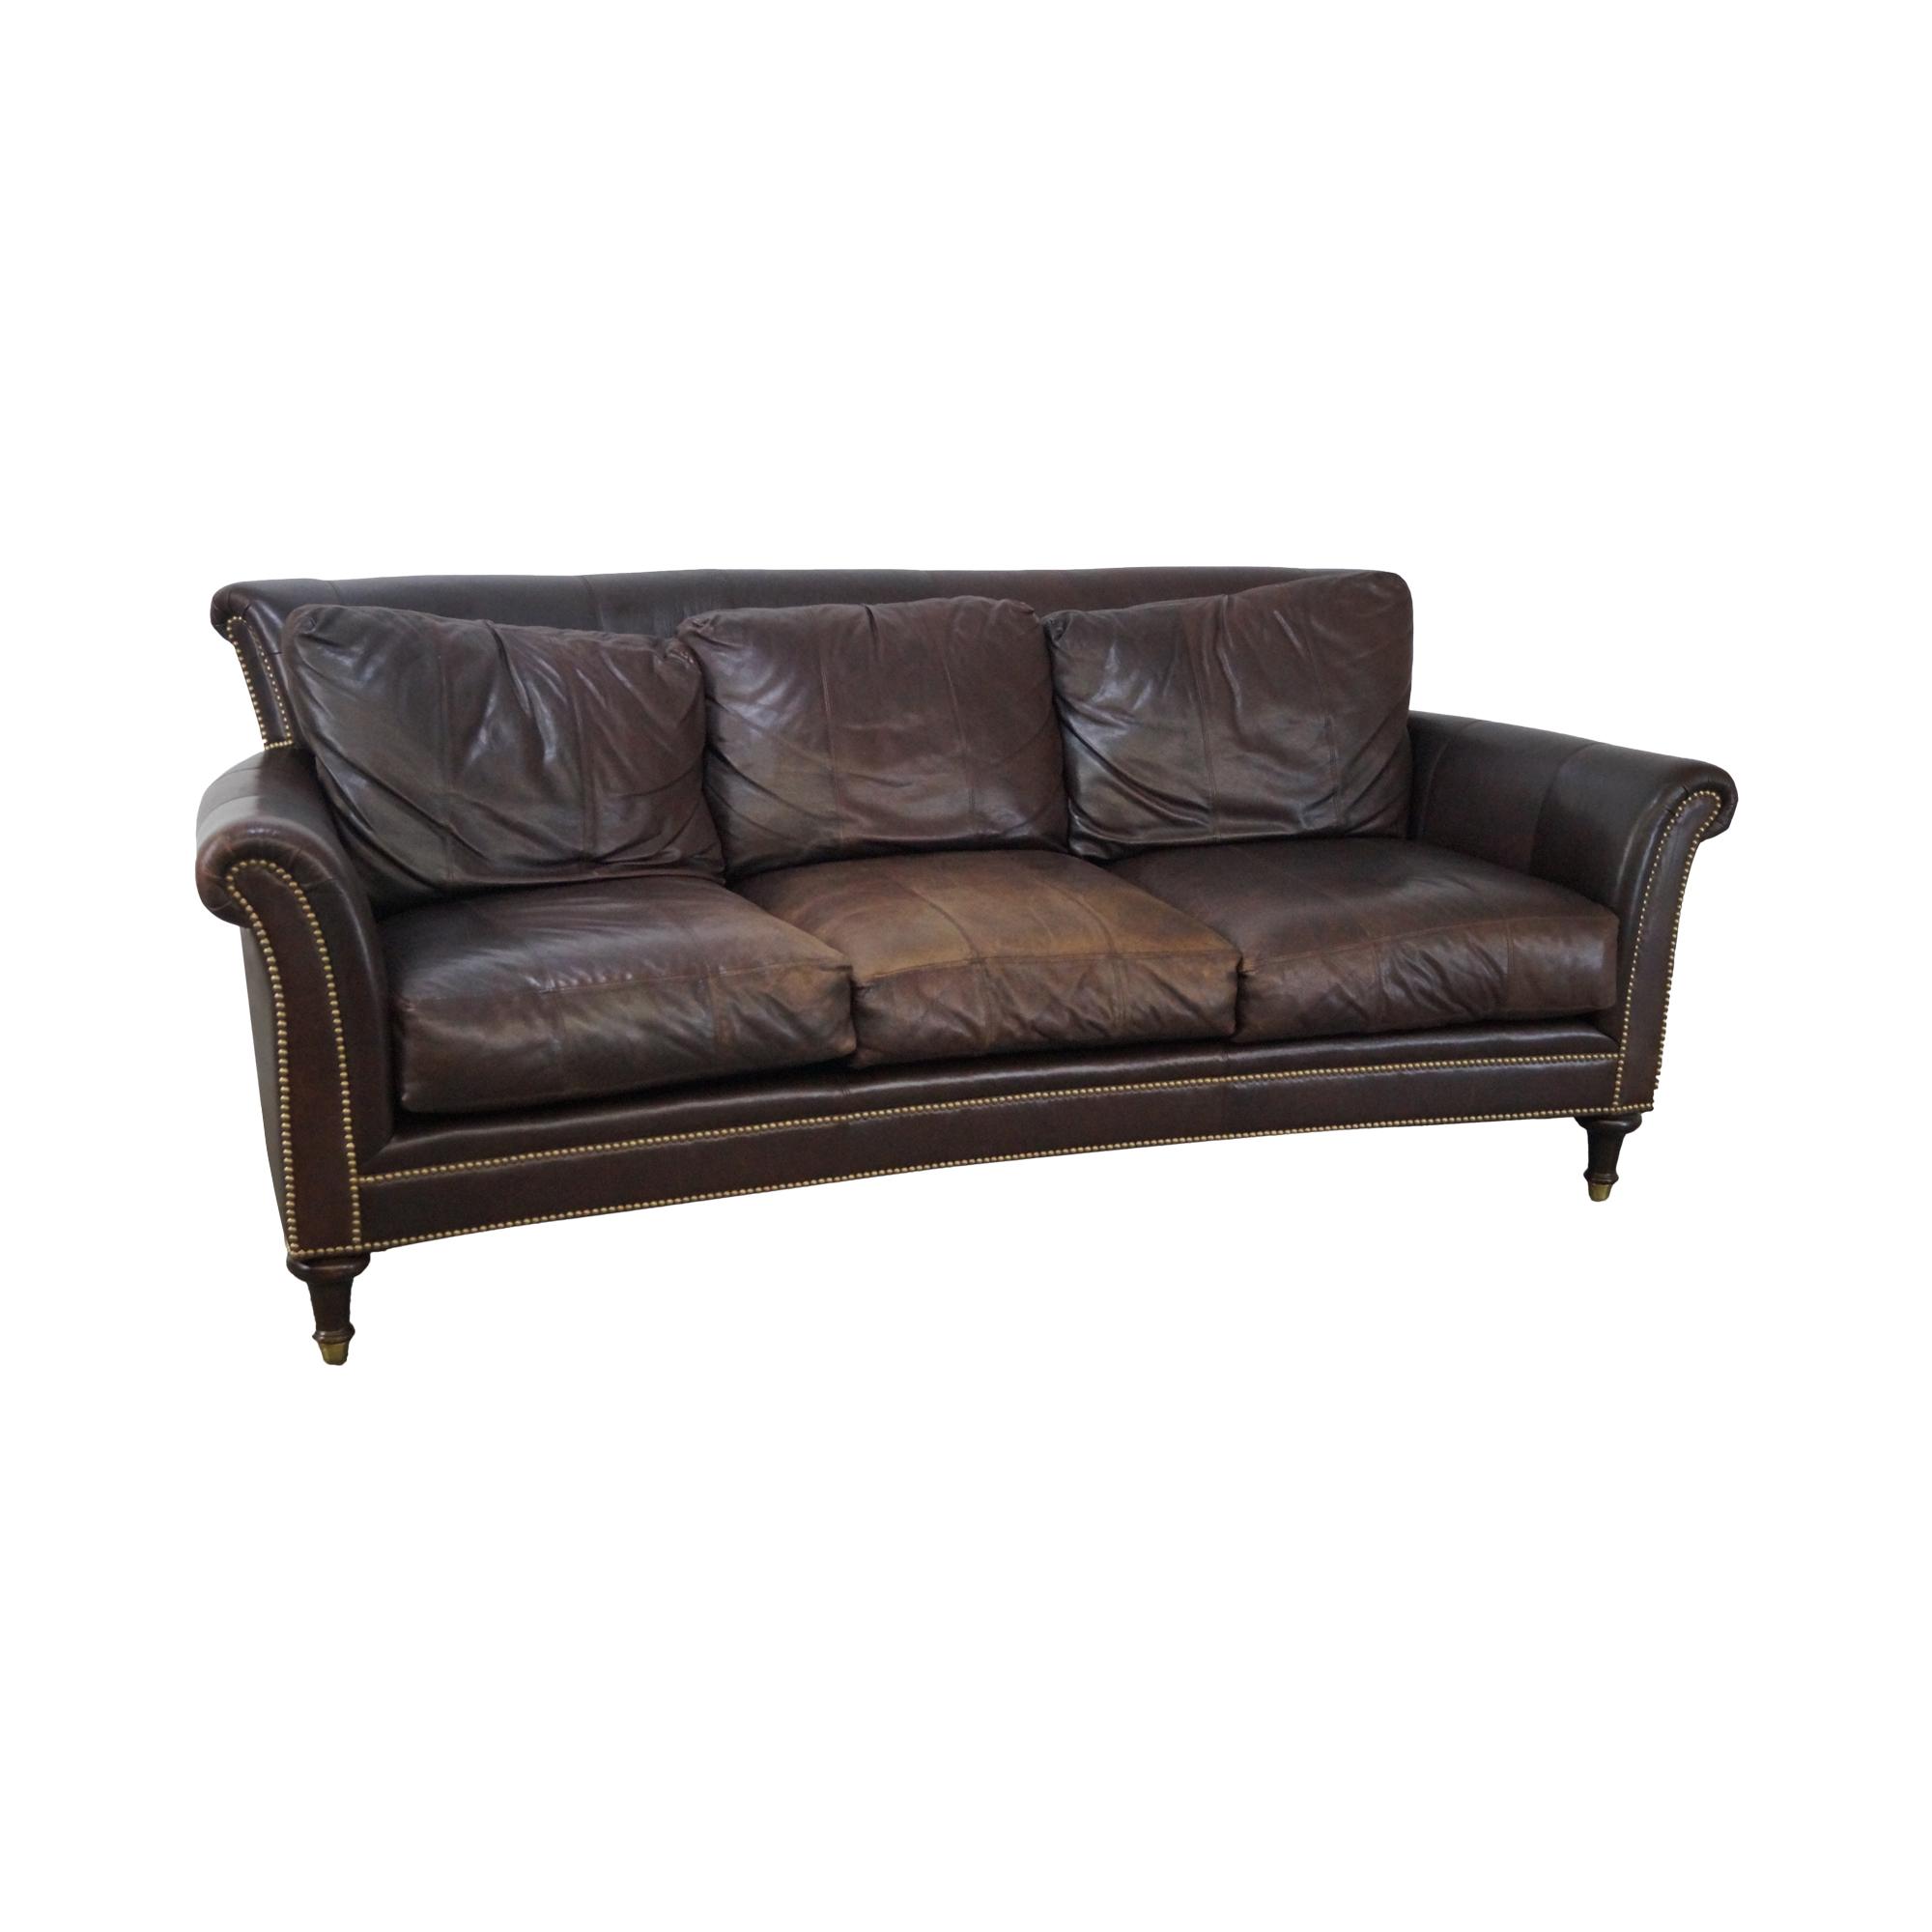 Superieur Ferguson Copeland Surrey Brown Leather Sofa